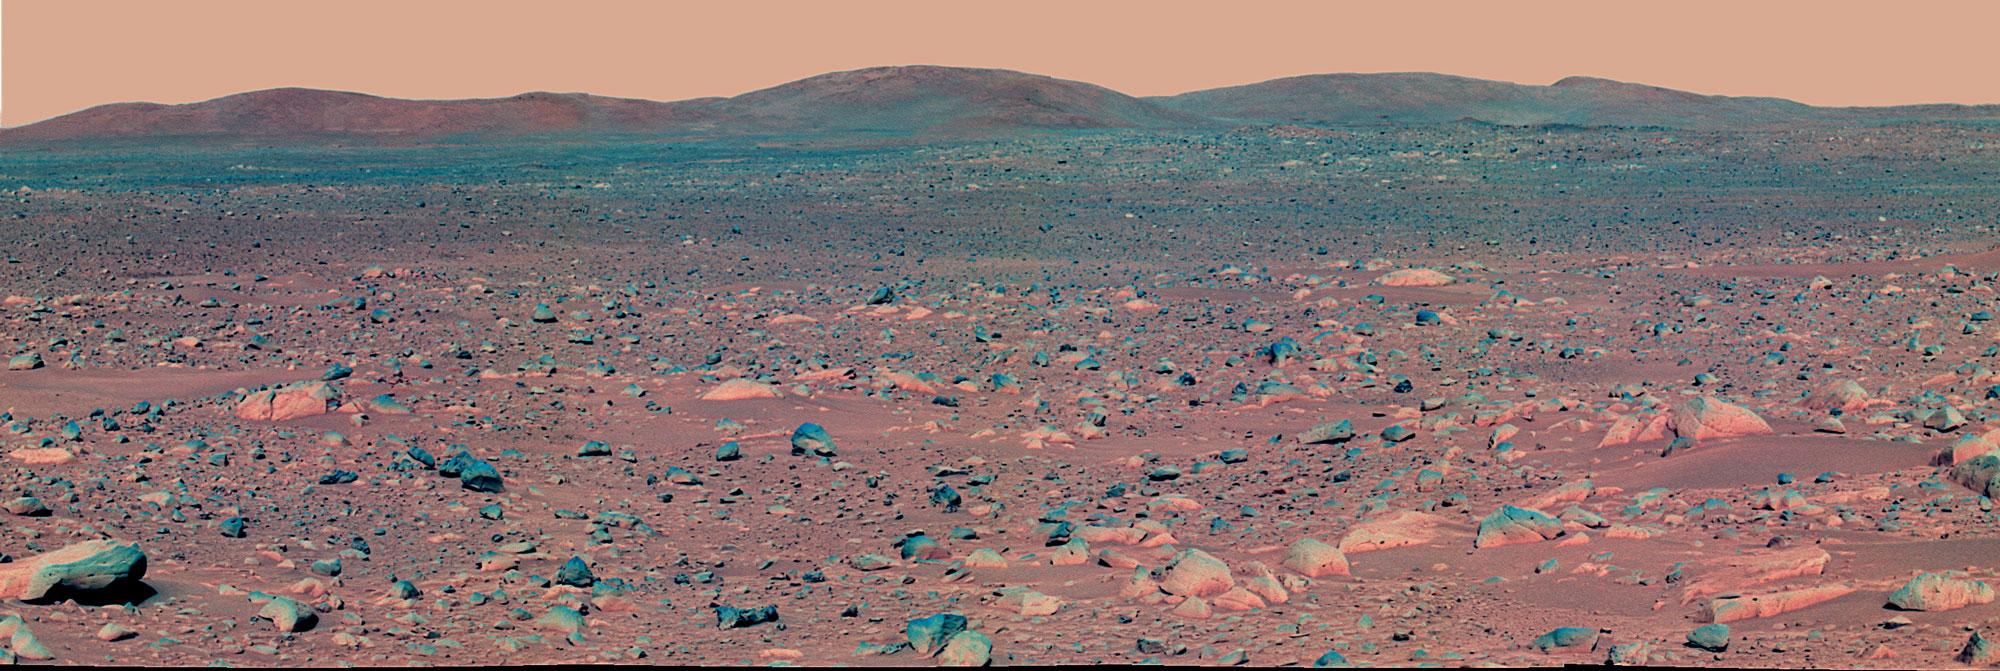 "Mars Rover ""Spirit"" Images"